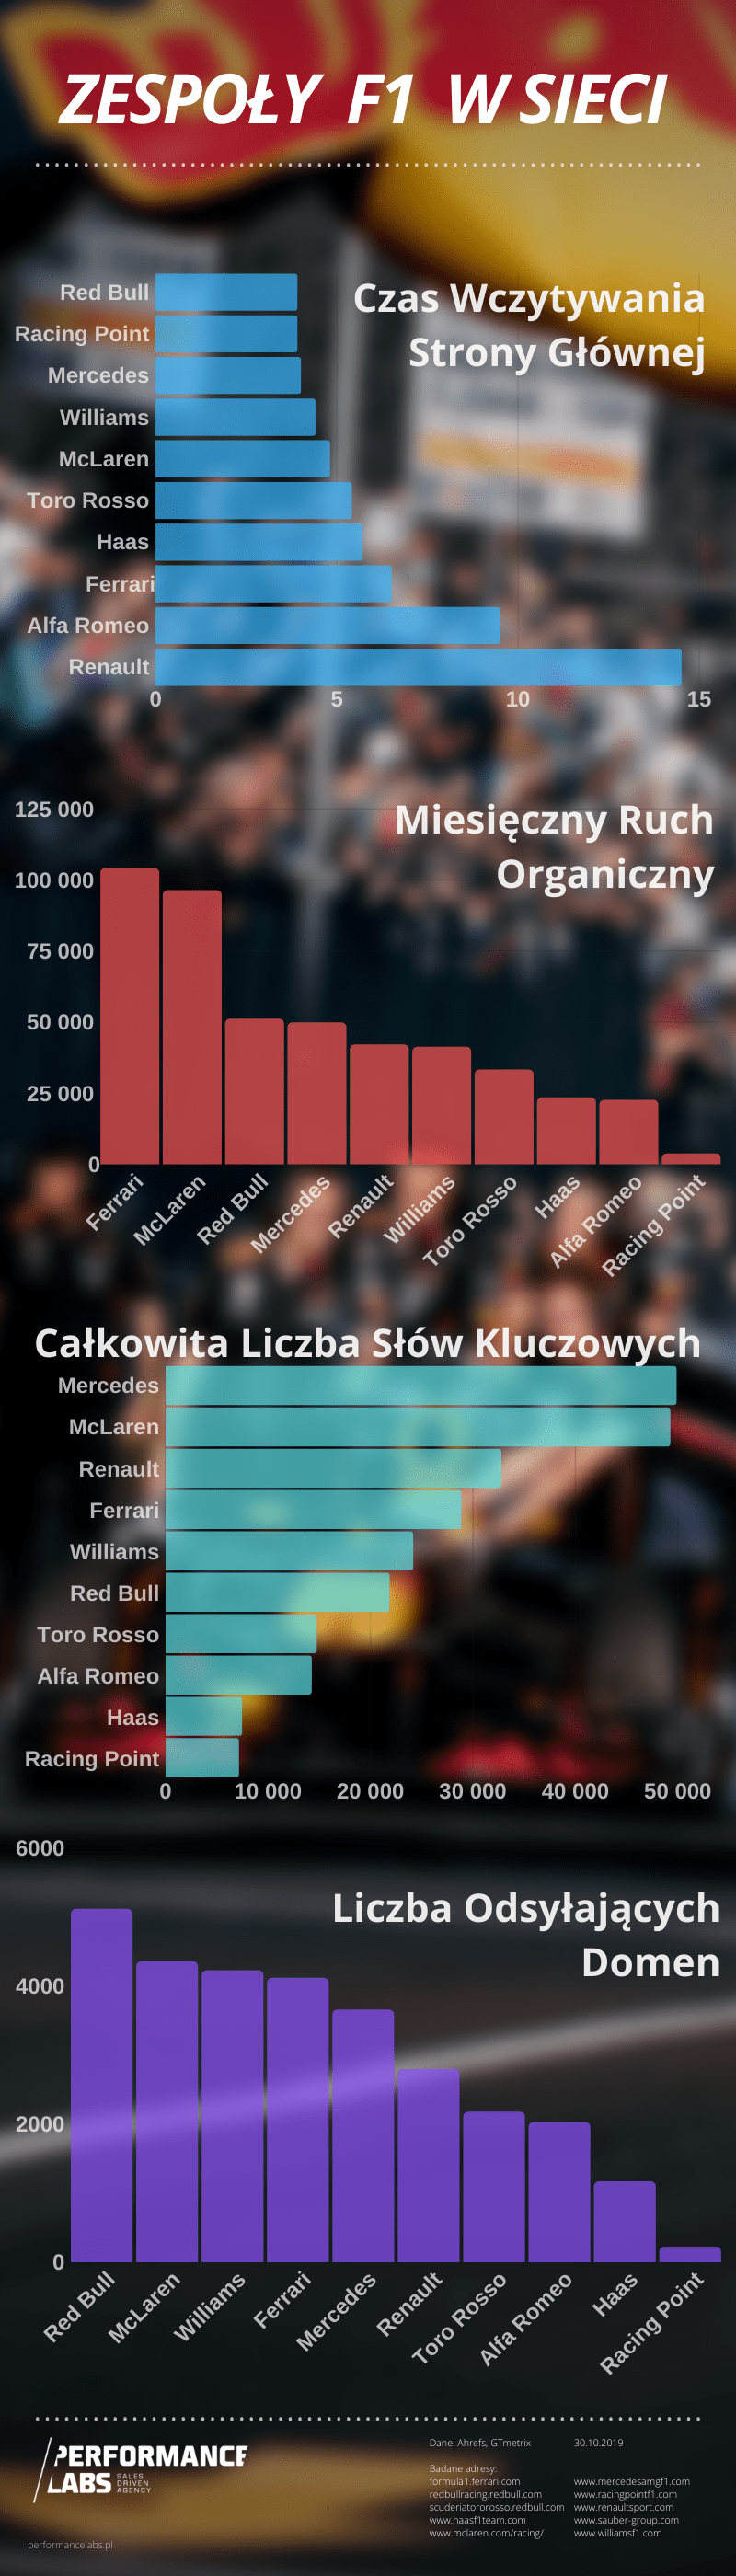 f1-infografika-performancelabs